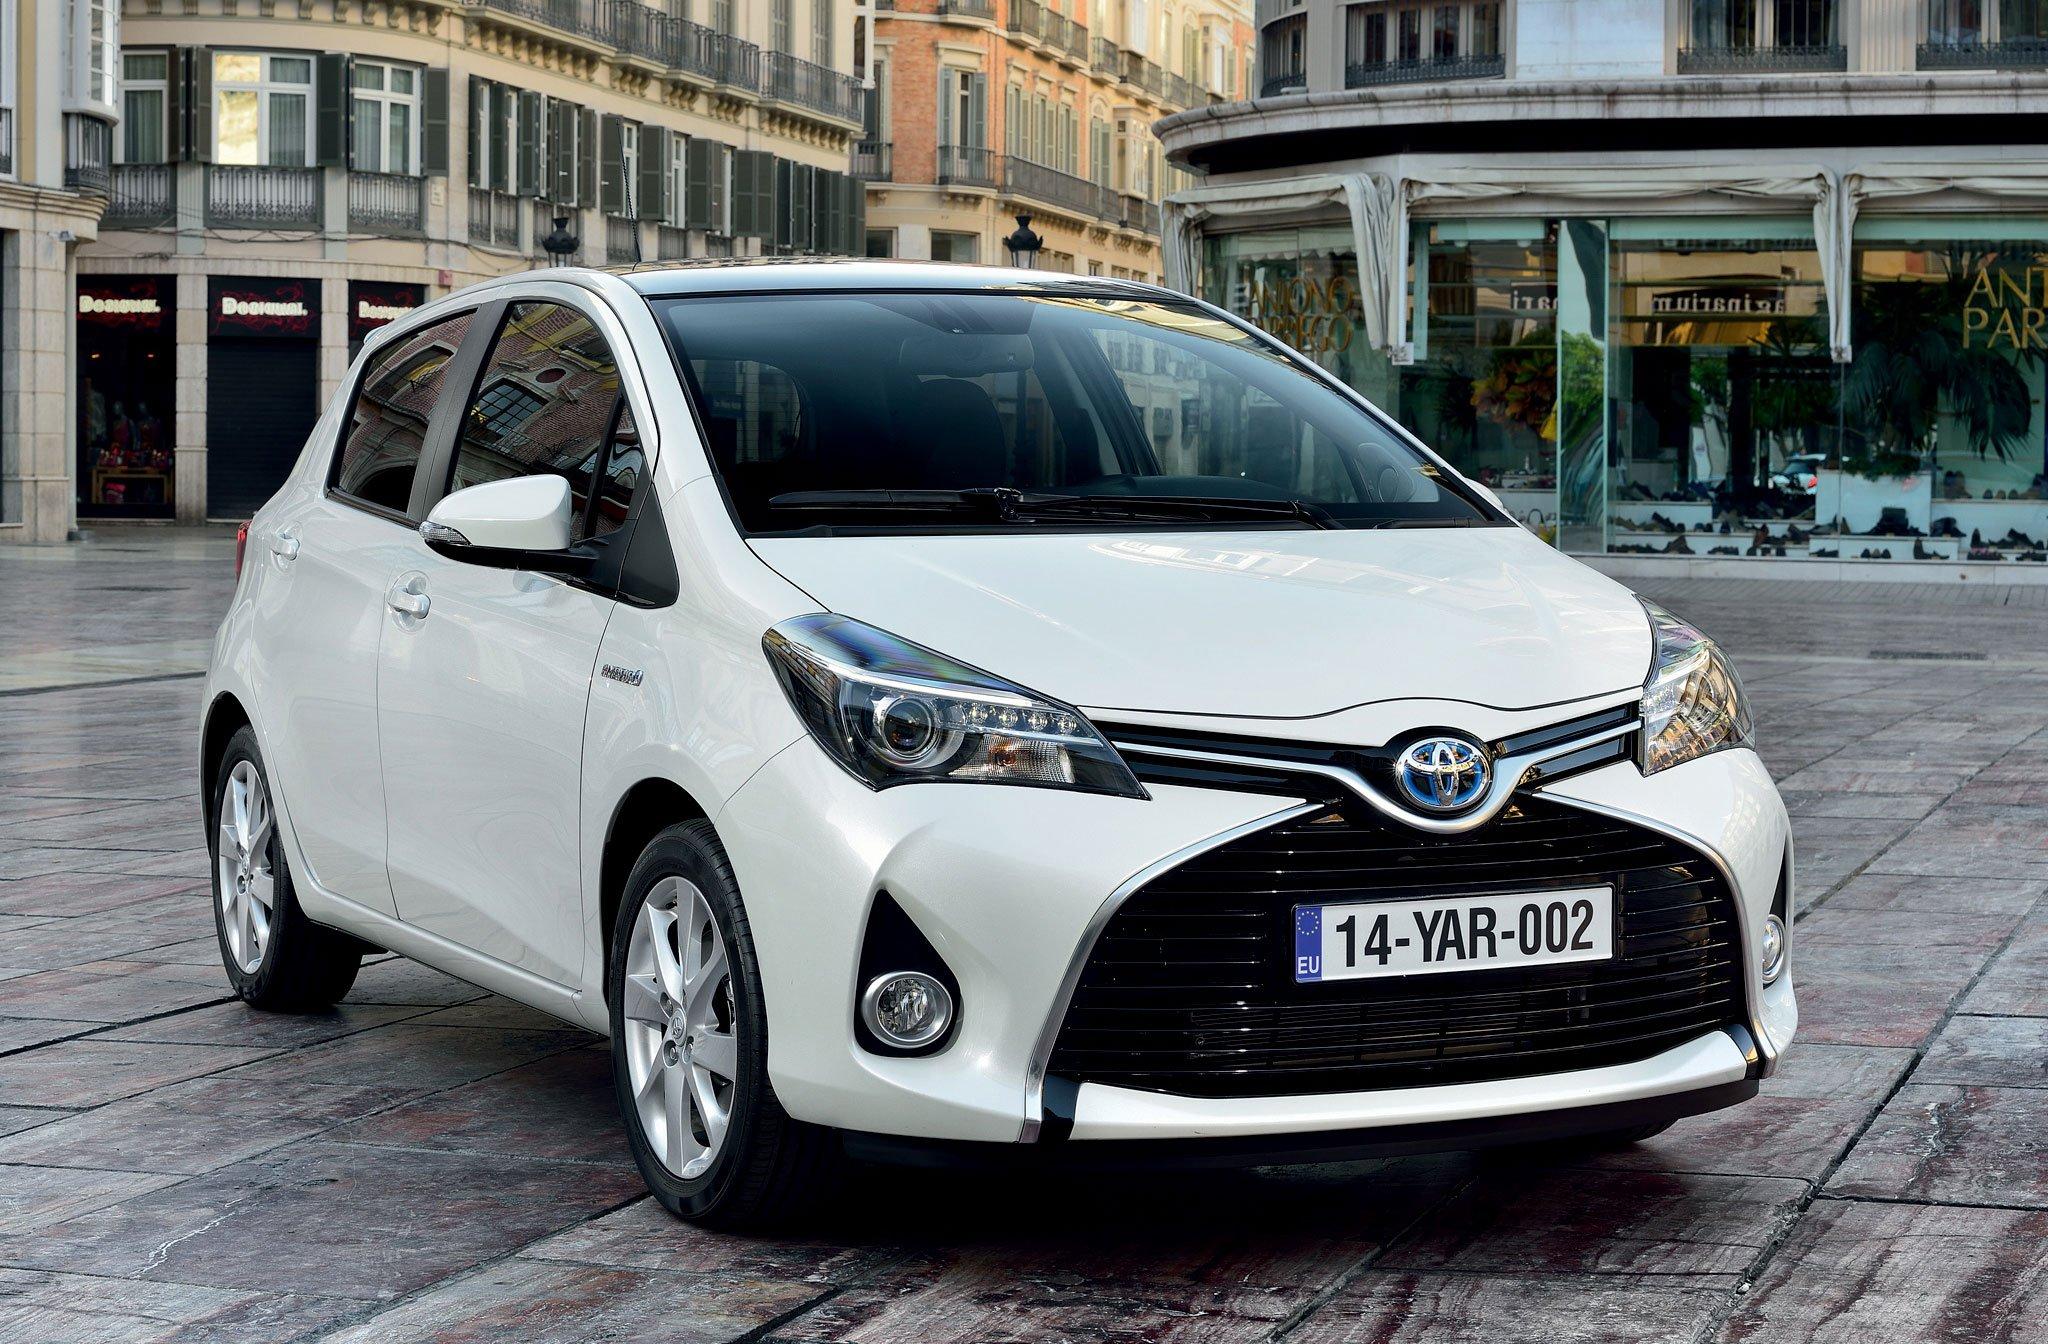 Toyota Yaris Hatchback New Upcoming Cars 2019 2020